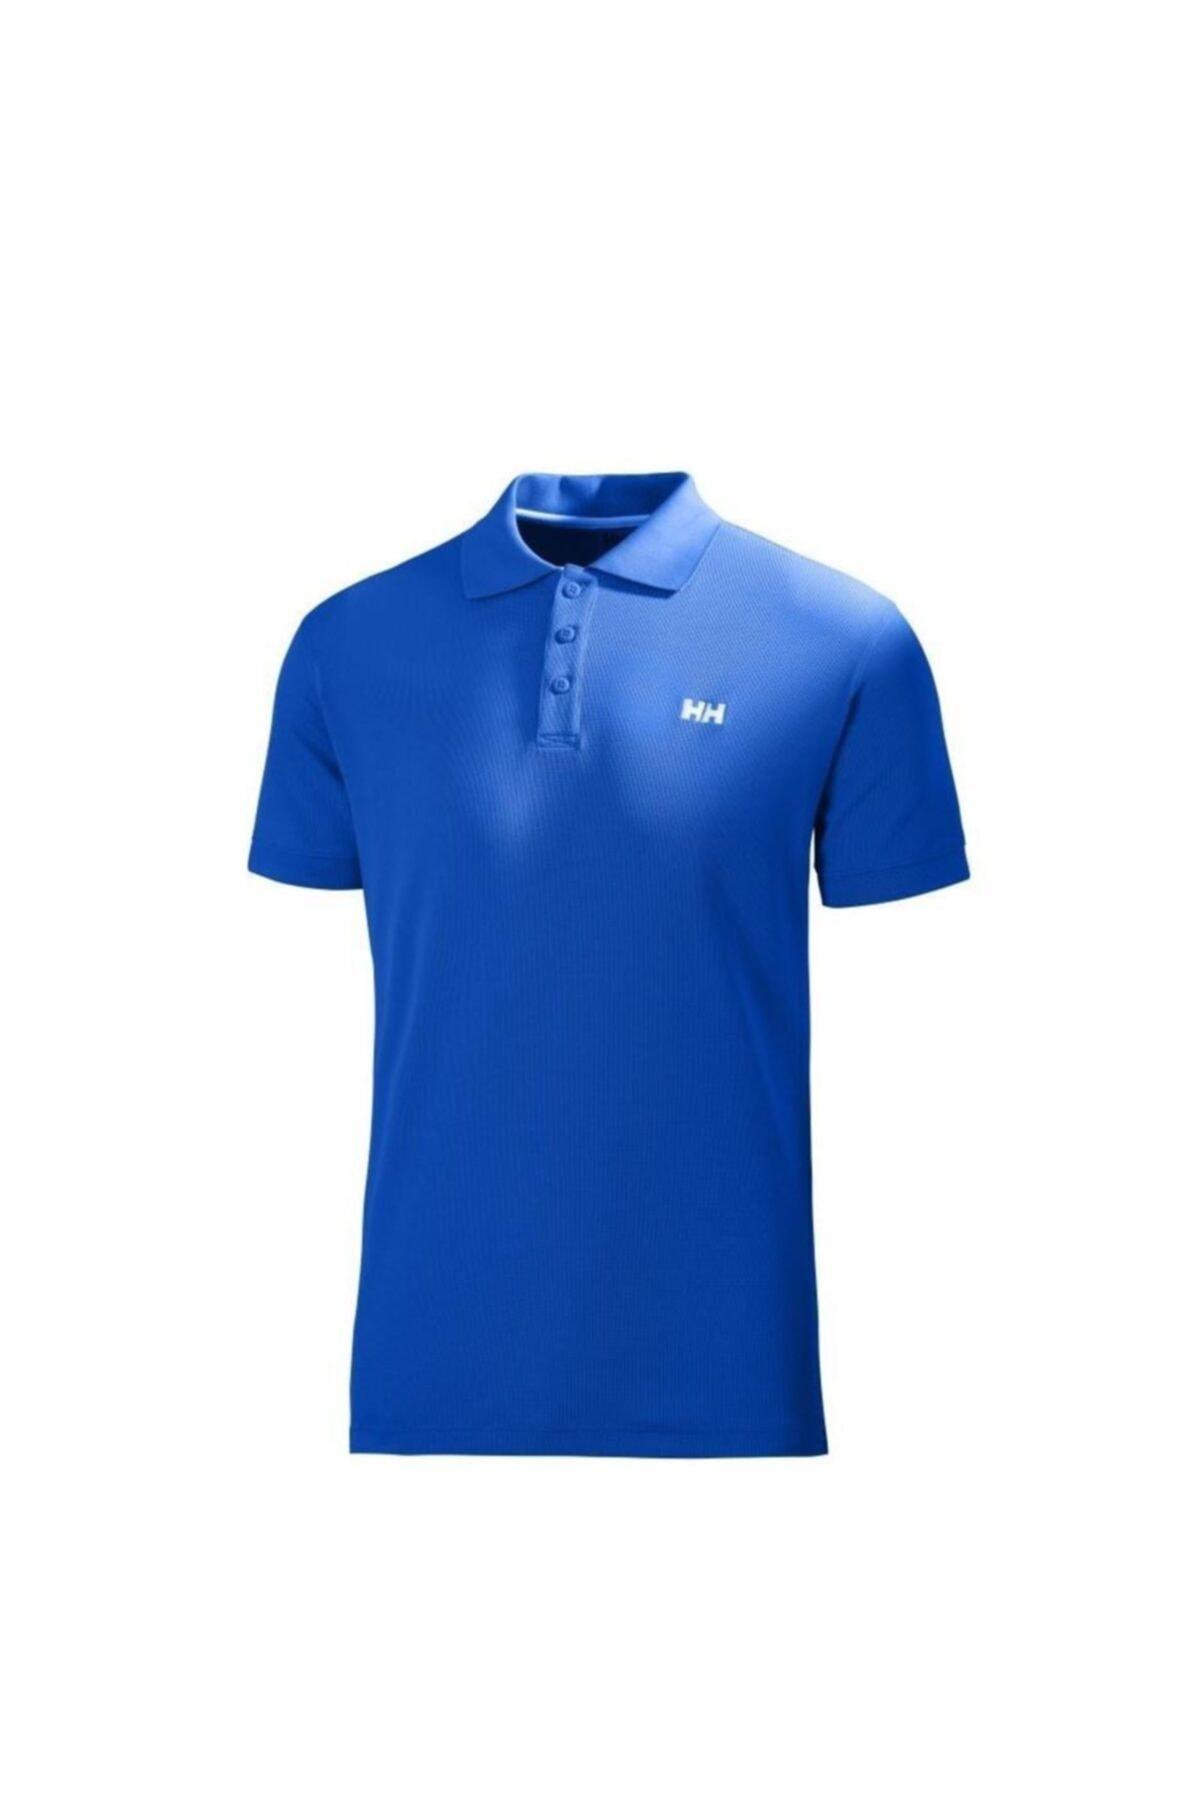 Helly Hansen Driftline Erkek Polo T-shirt Olympian Blue 1